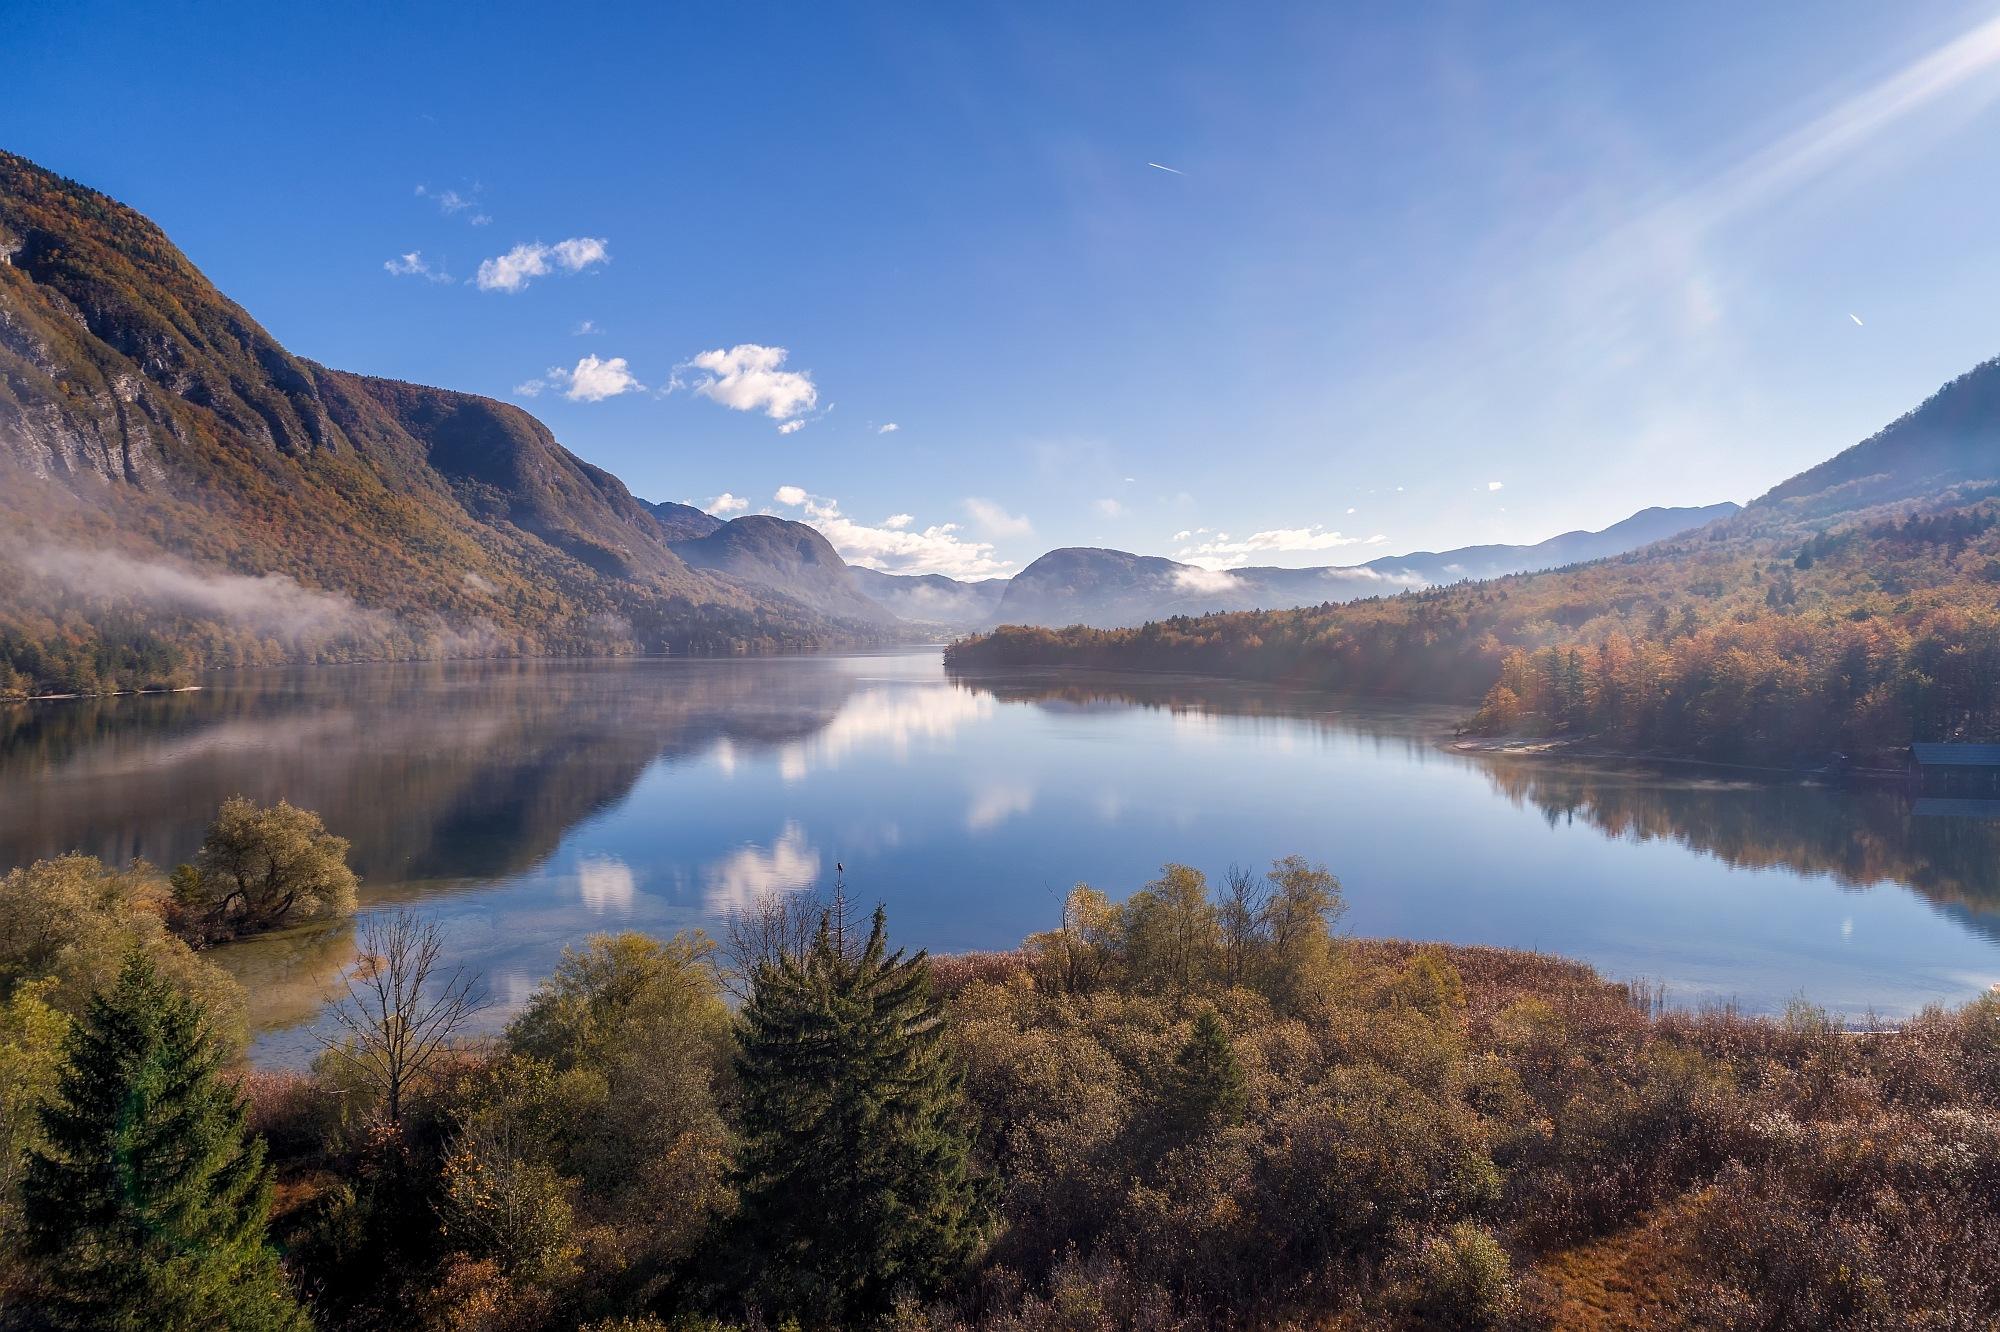 Lake Bohinj by Dragan Gavranovic